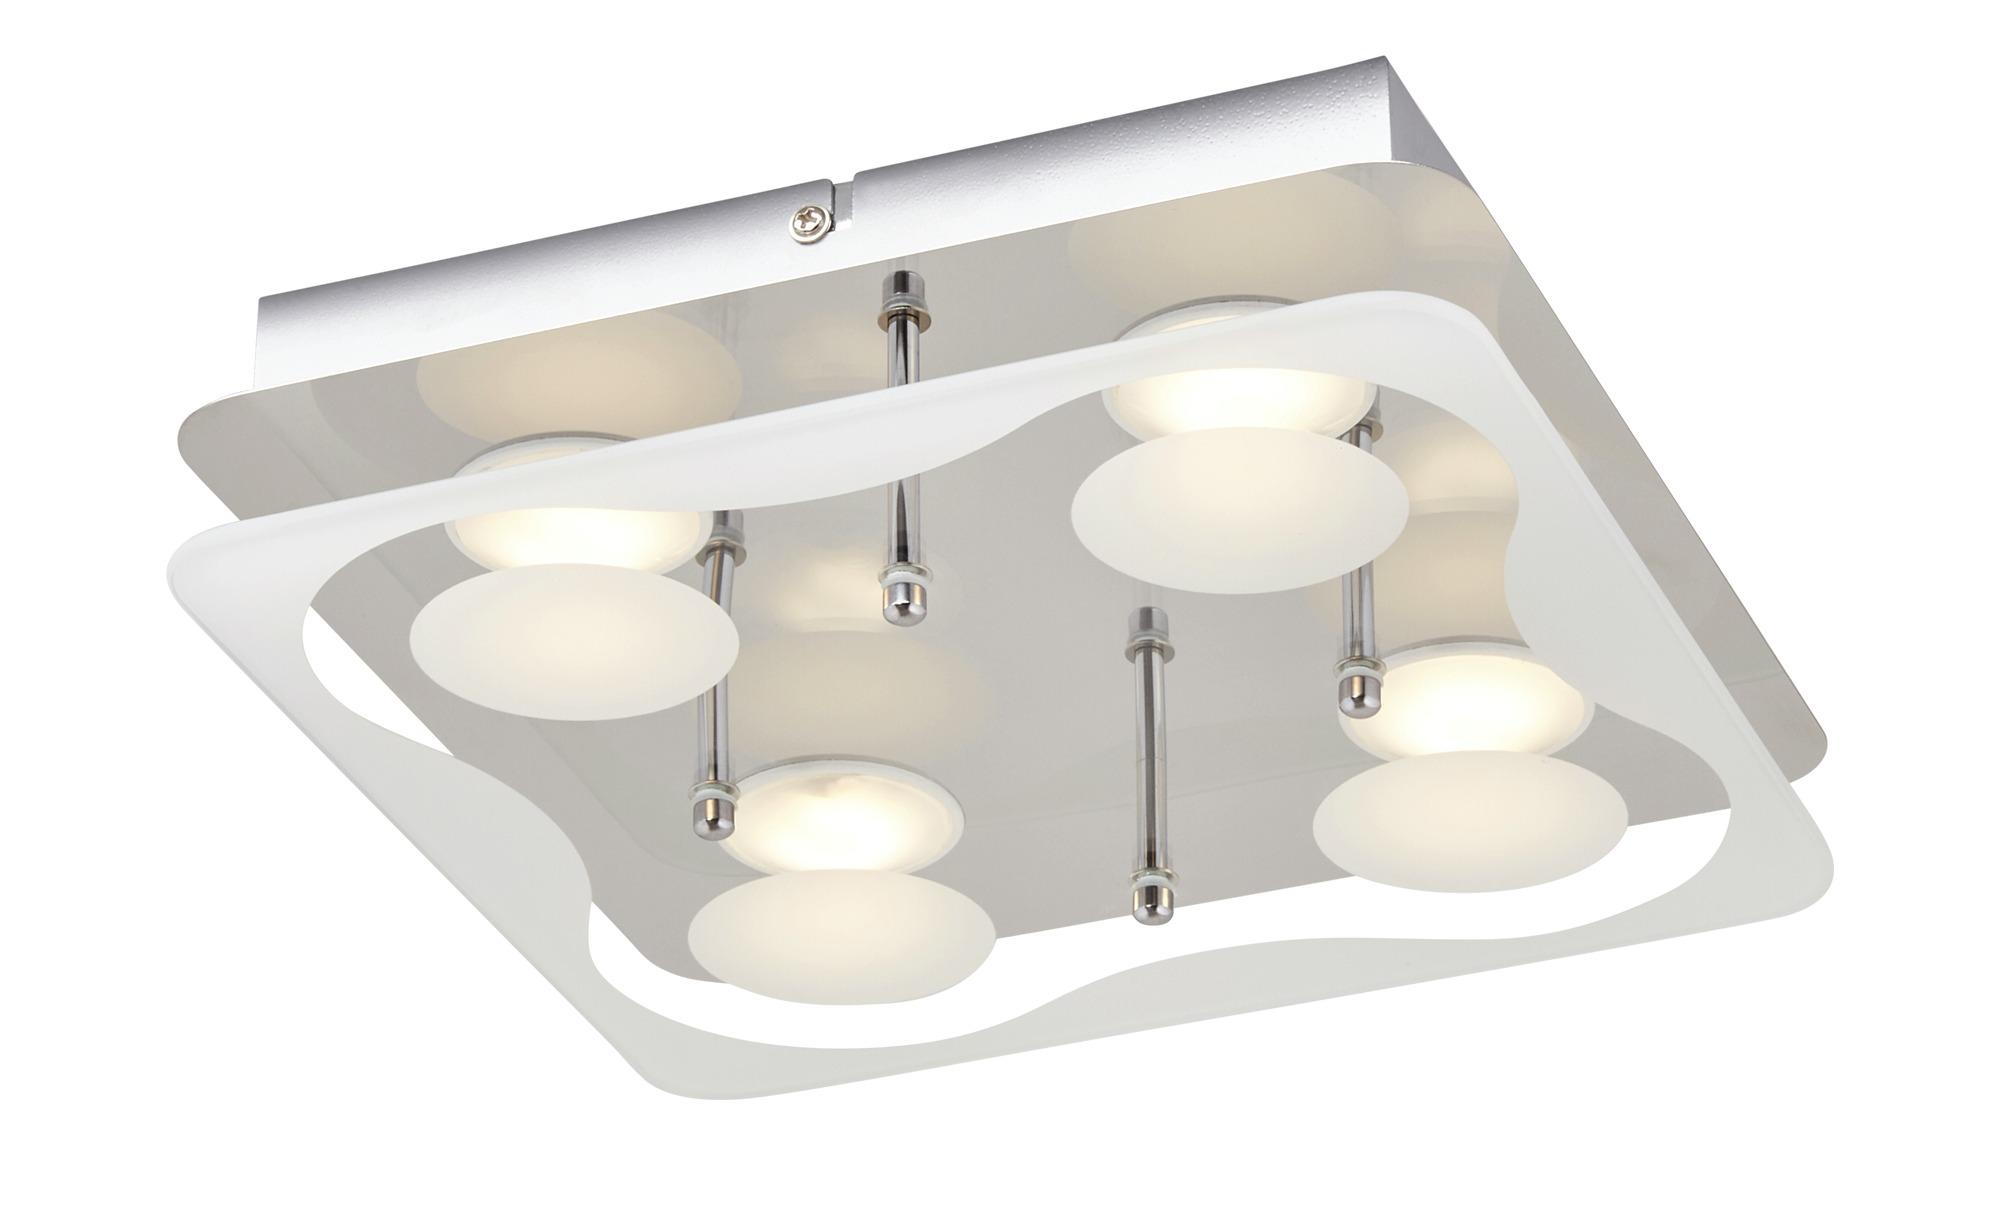 KHG LED-Deckenleuchte ¦ silber ¦ Maße (cm): B: 25 H: 6 Lampen & Leuchten > Innenleuchten > Deckenleuchten - Höffner